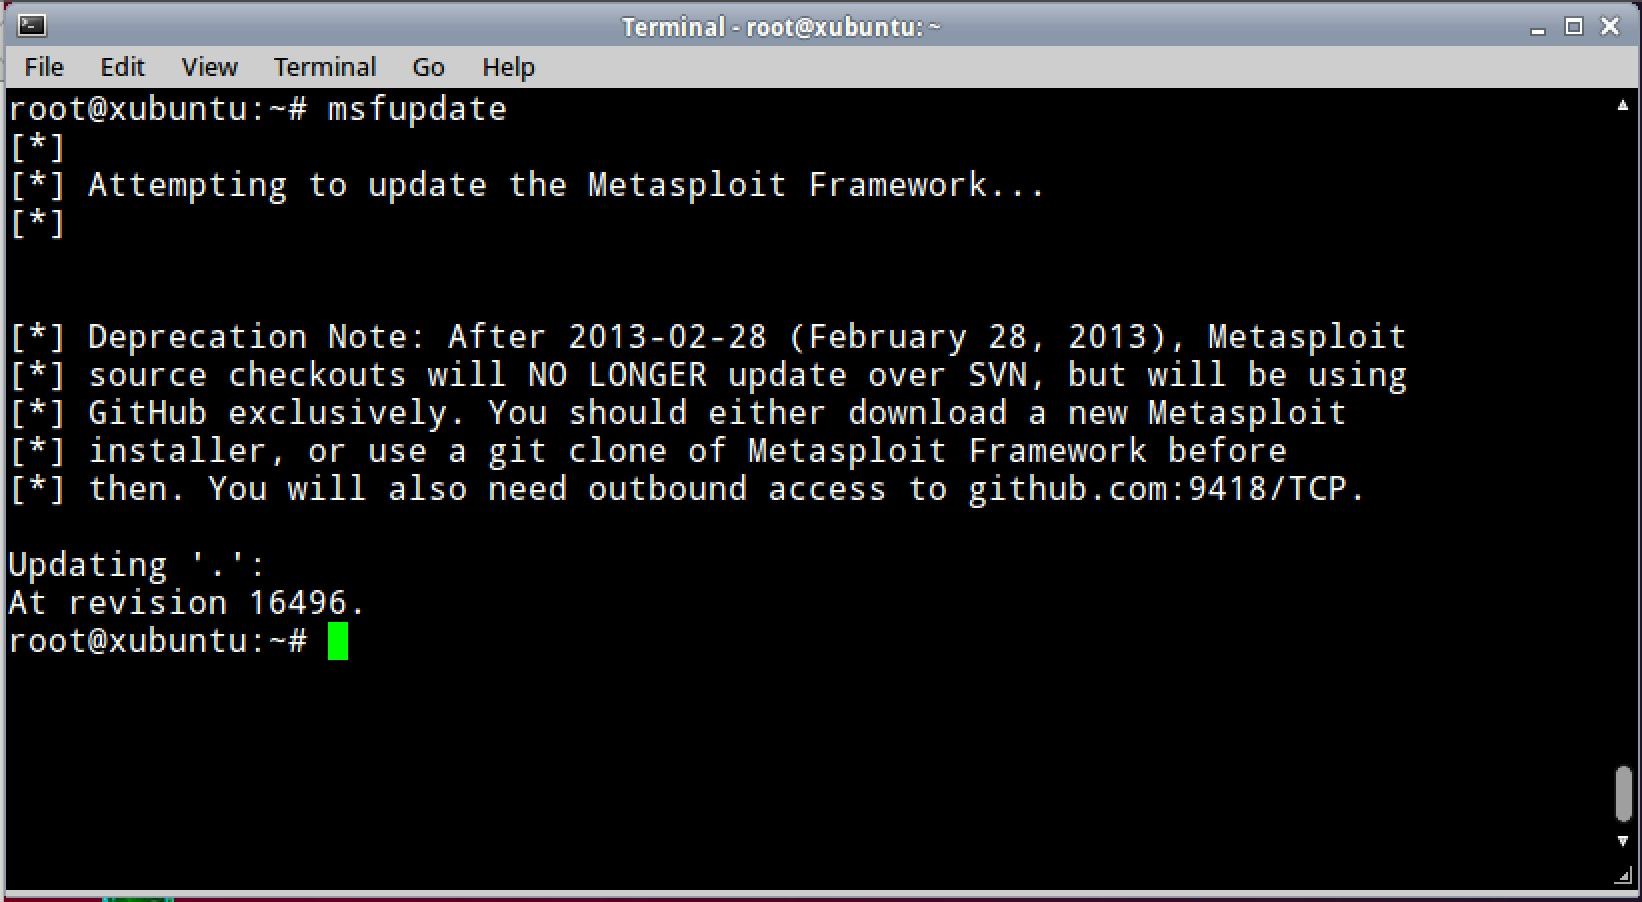 Deprecation Notice: Metasploit source checkouts will NO LONGER